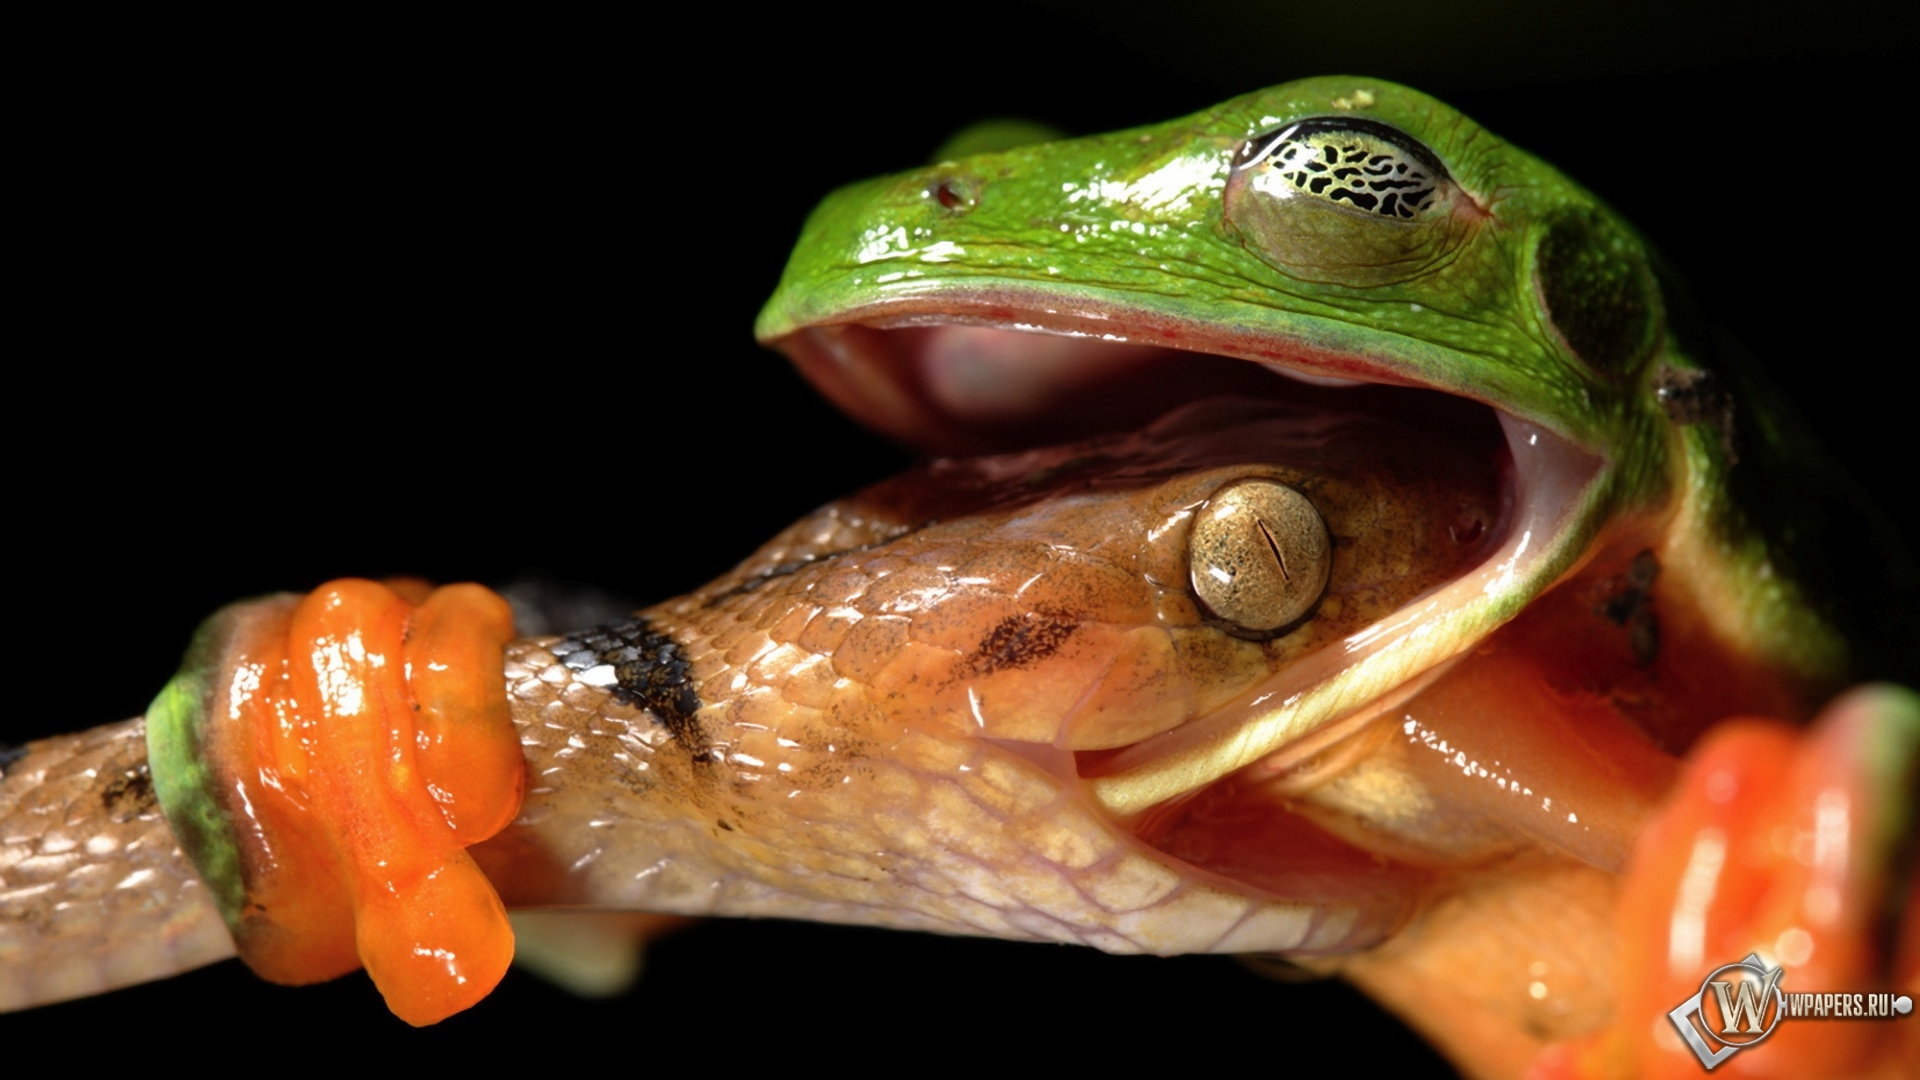 Змея укусила лягушку 1920x1080